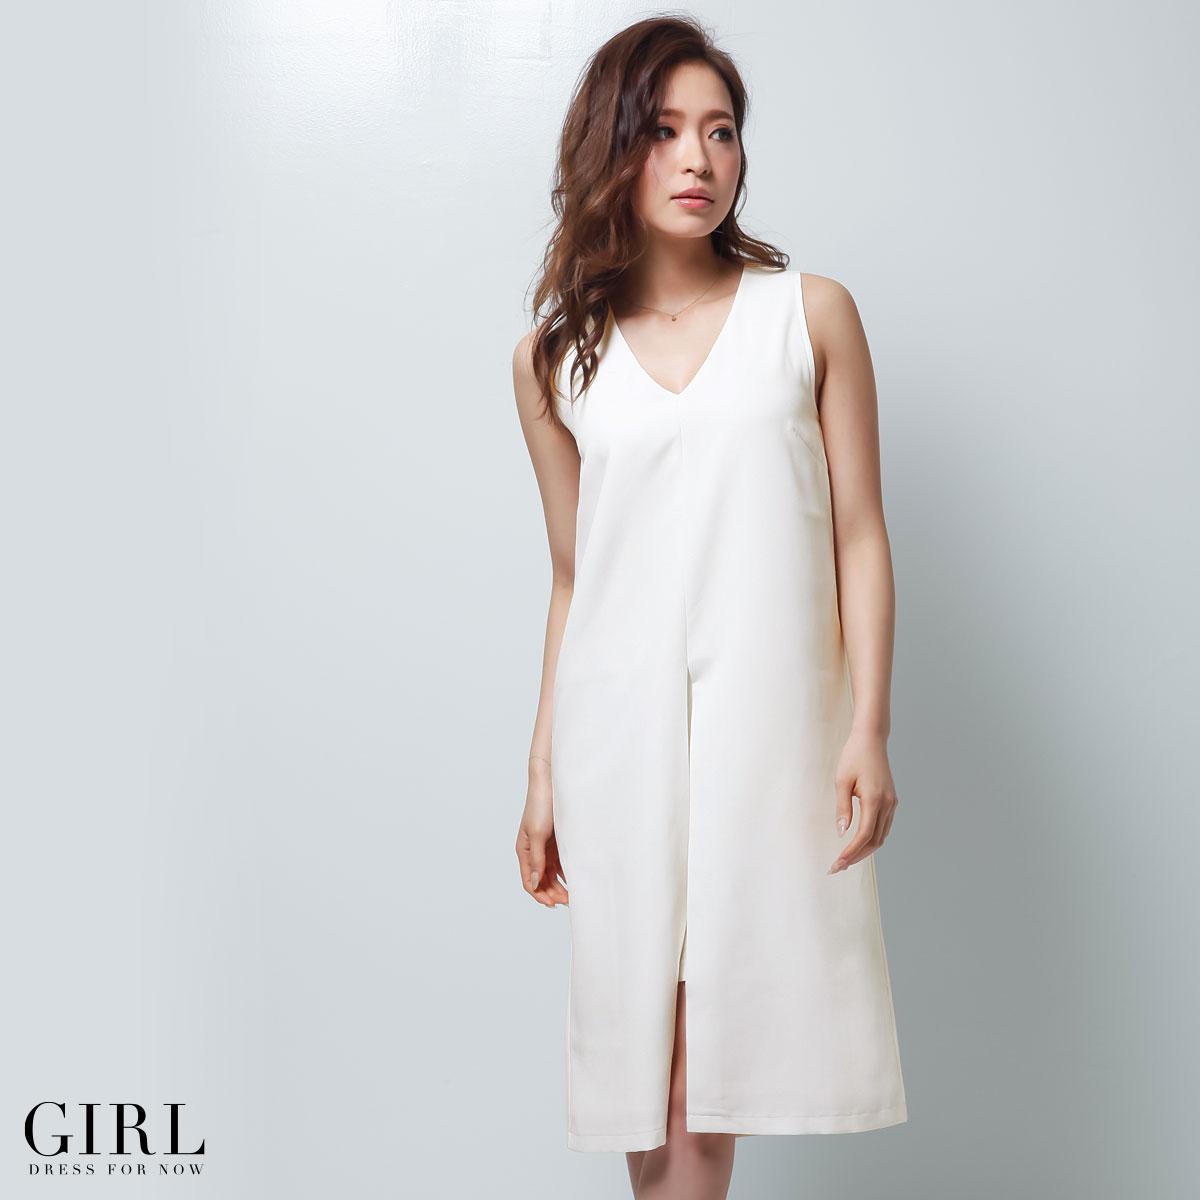 Dress shop GIRL | Rakuten Global Market: Prom dress pants dress ...